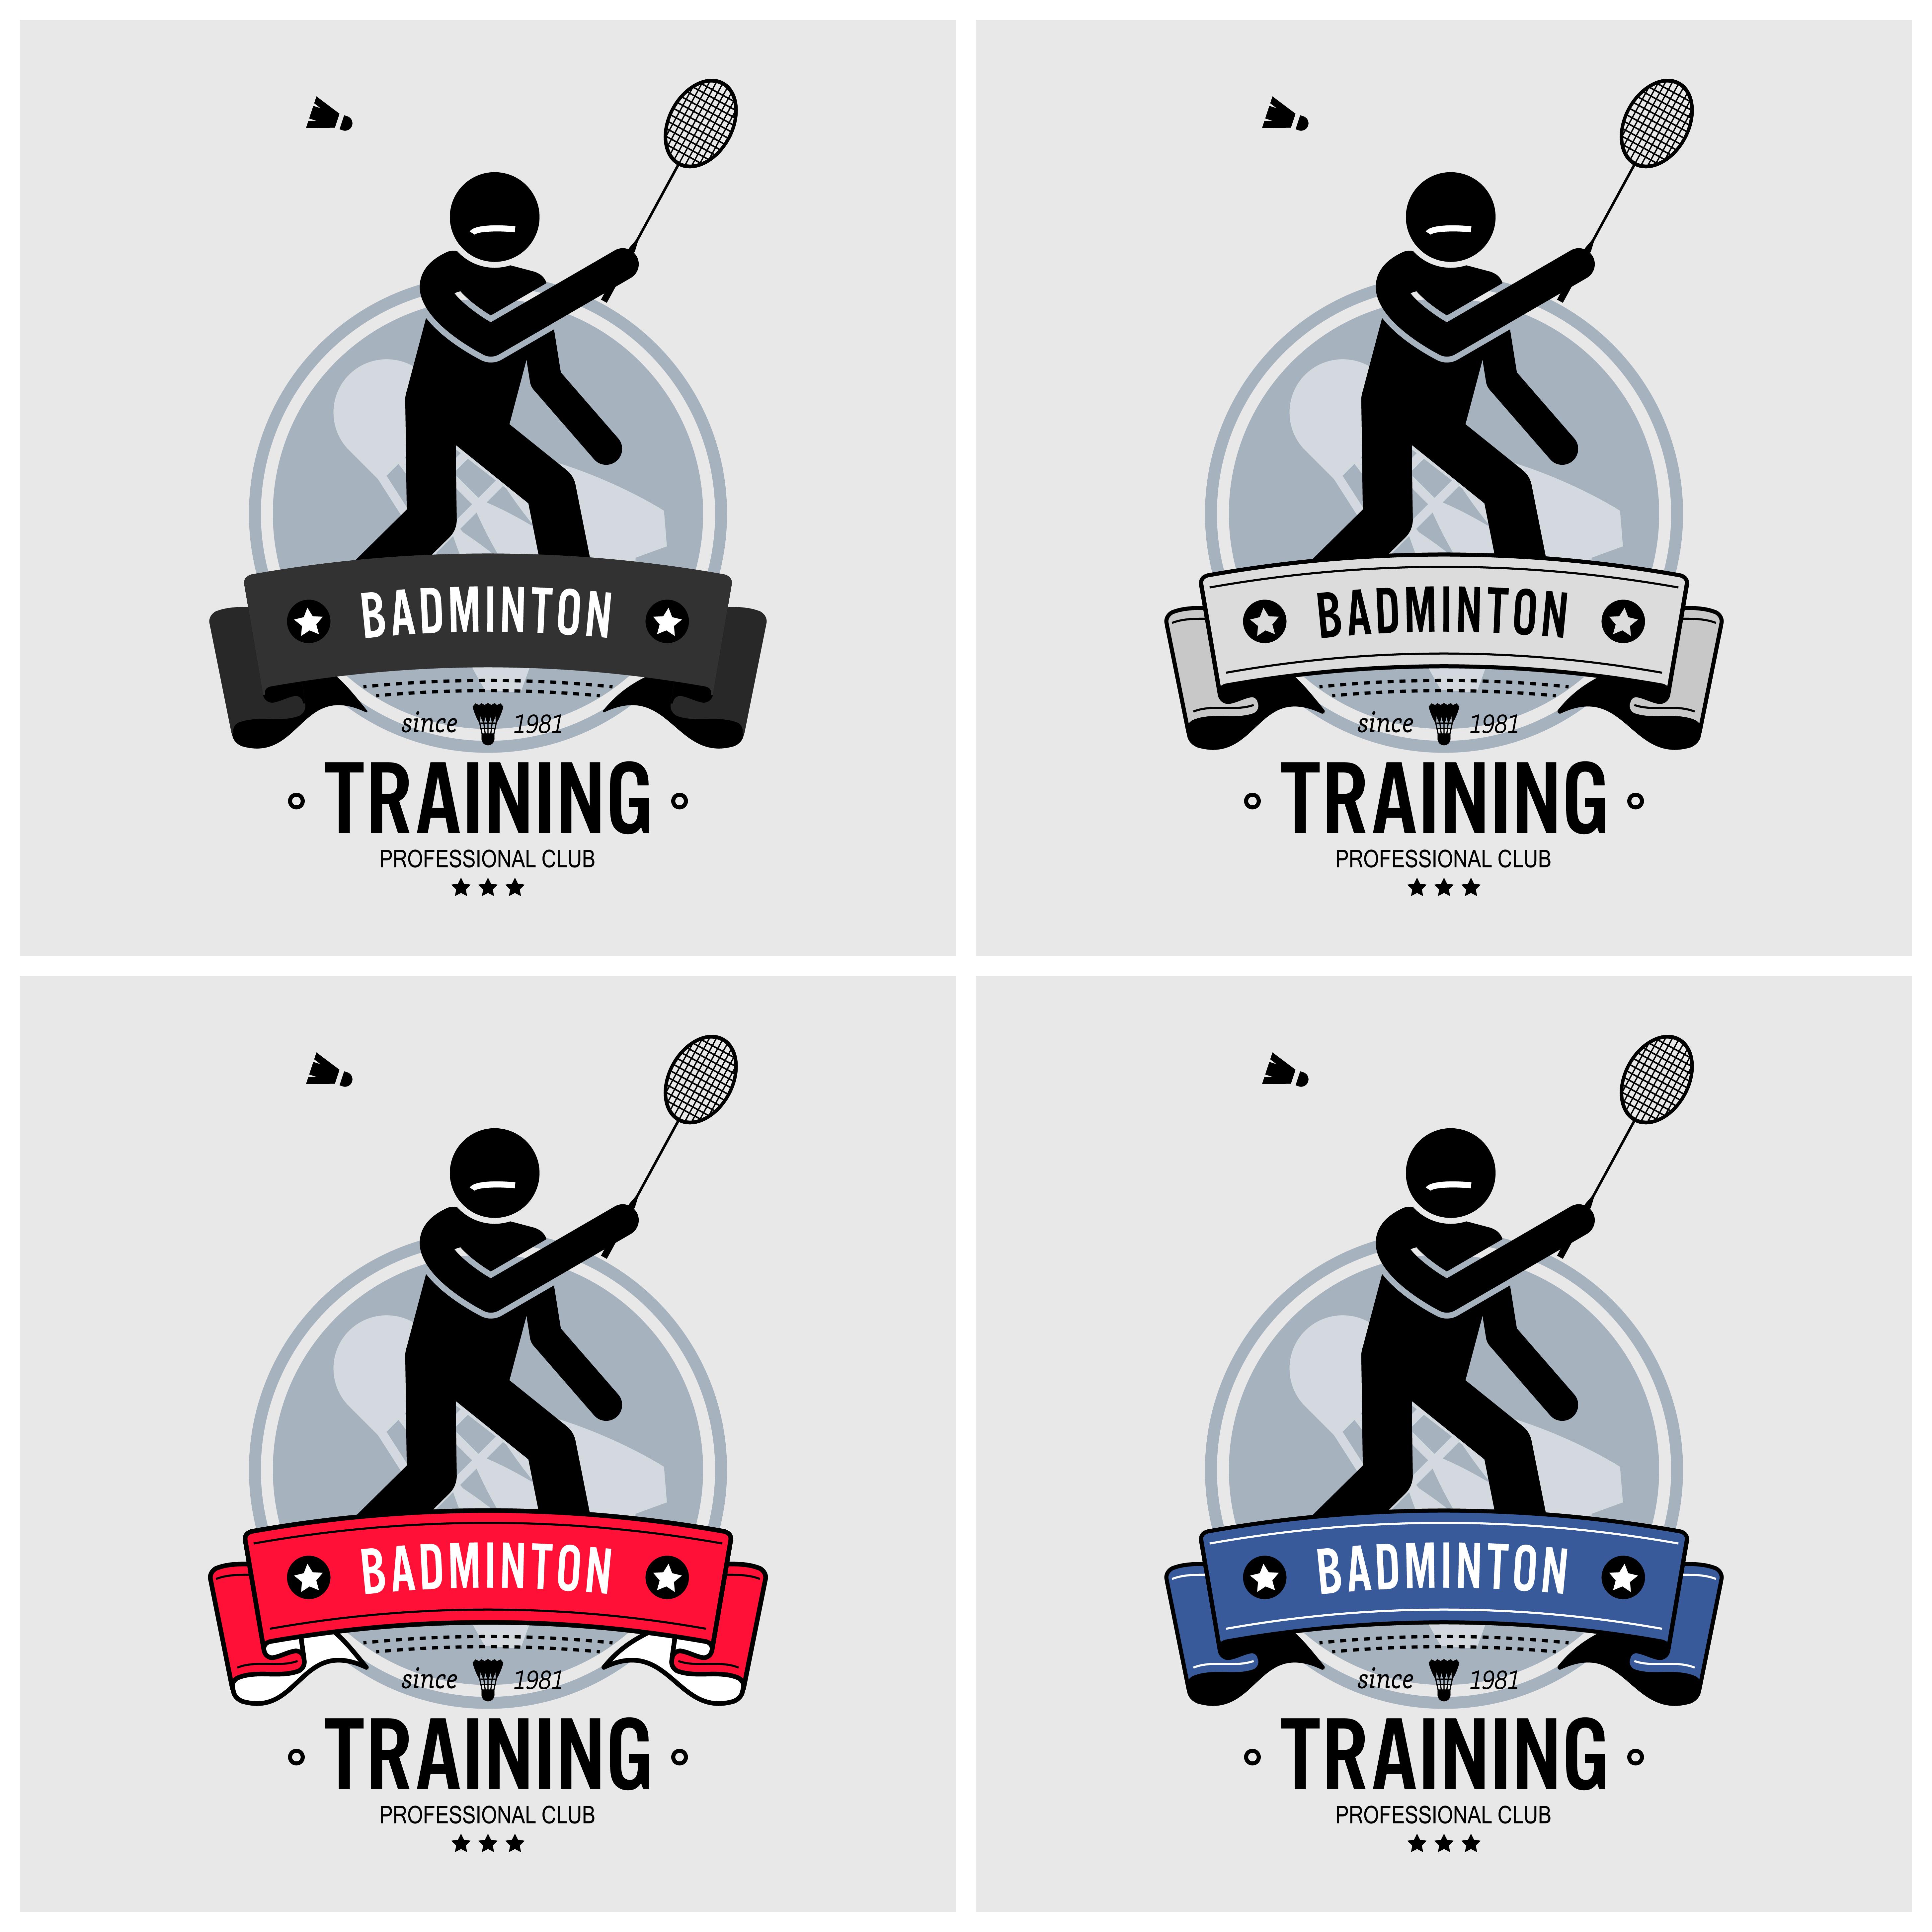 Badminton club logo design. - Download Free Vectors